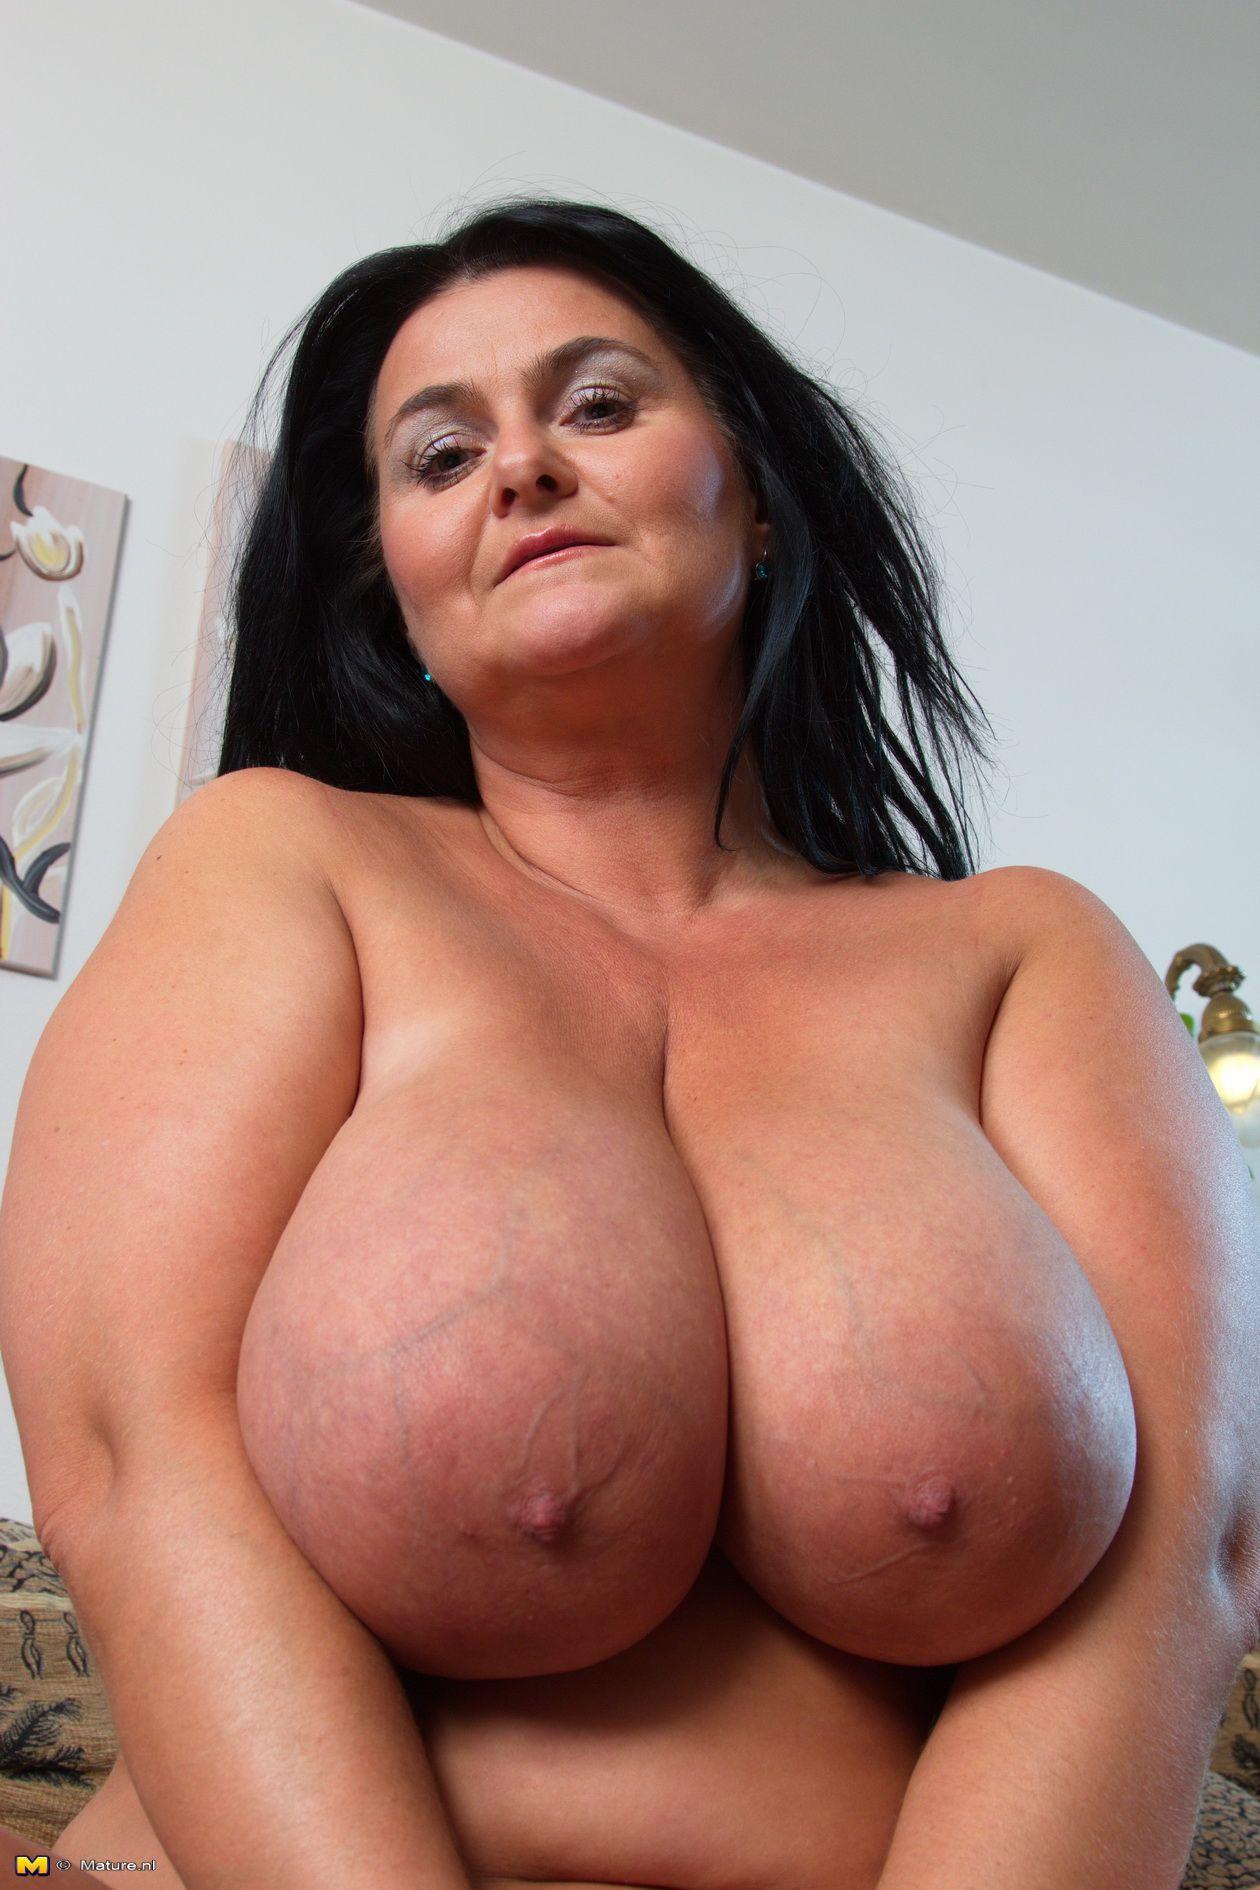 Mature women natural tits